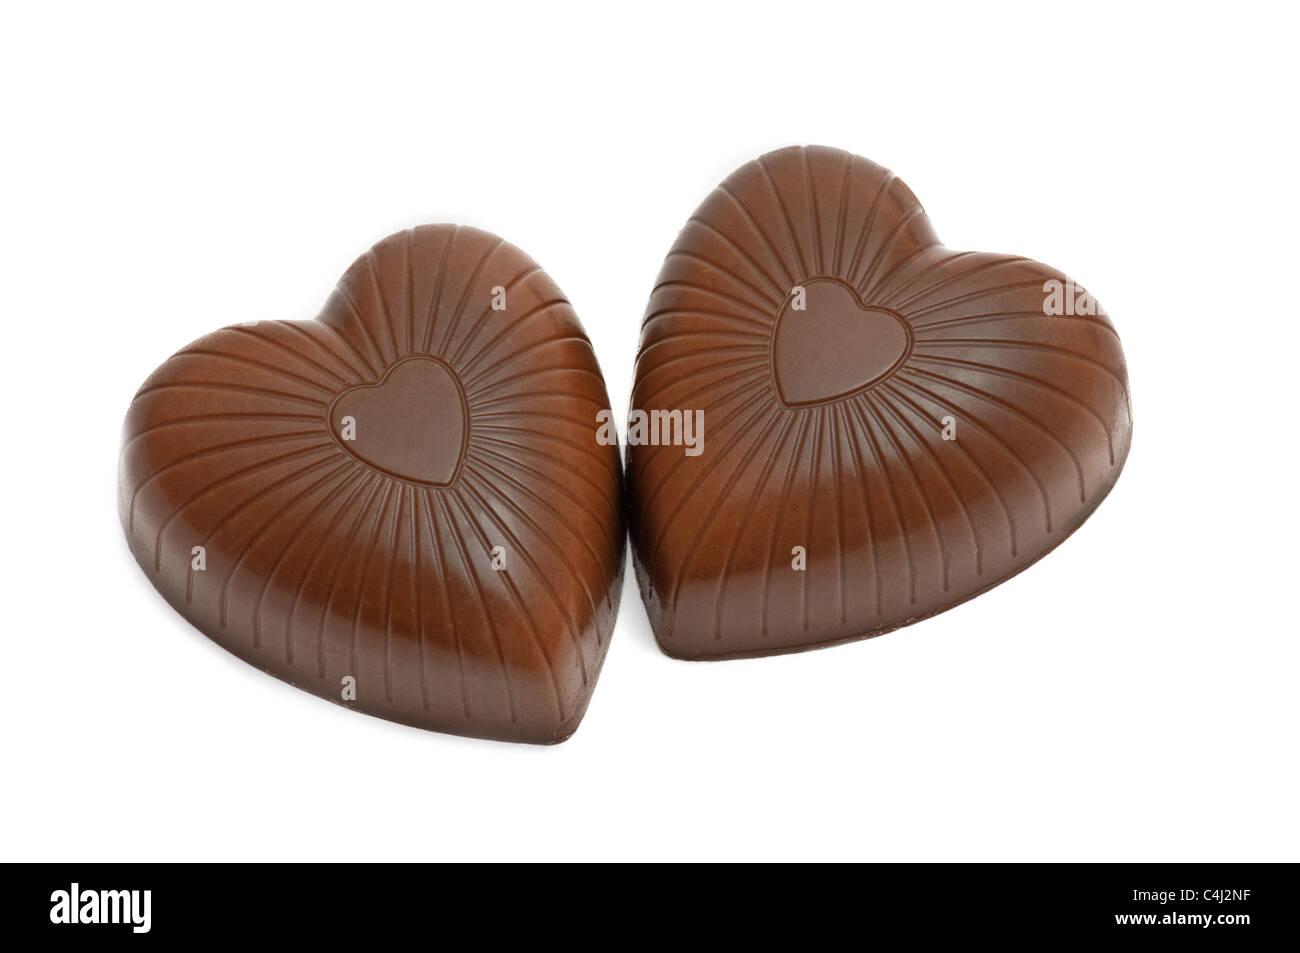 Par de golosinas de chocolate, corazón fuerte sobre blanco Imagen De Stock